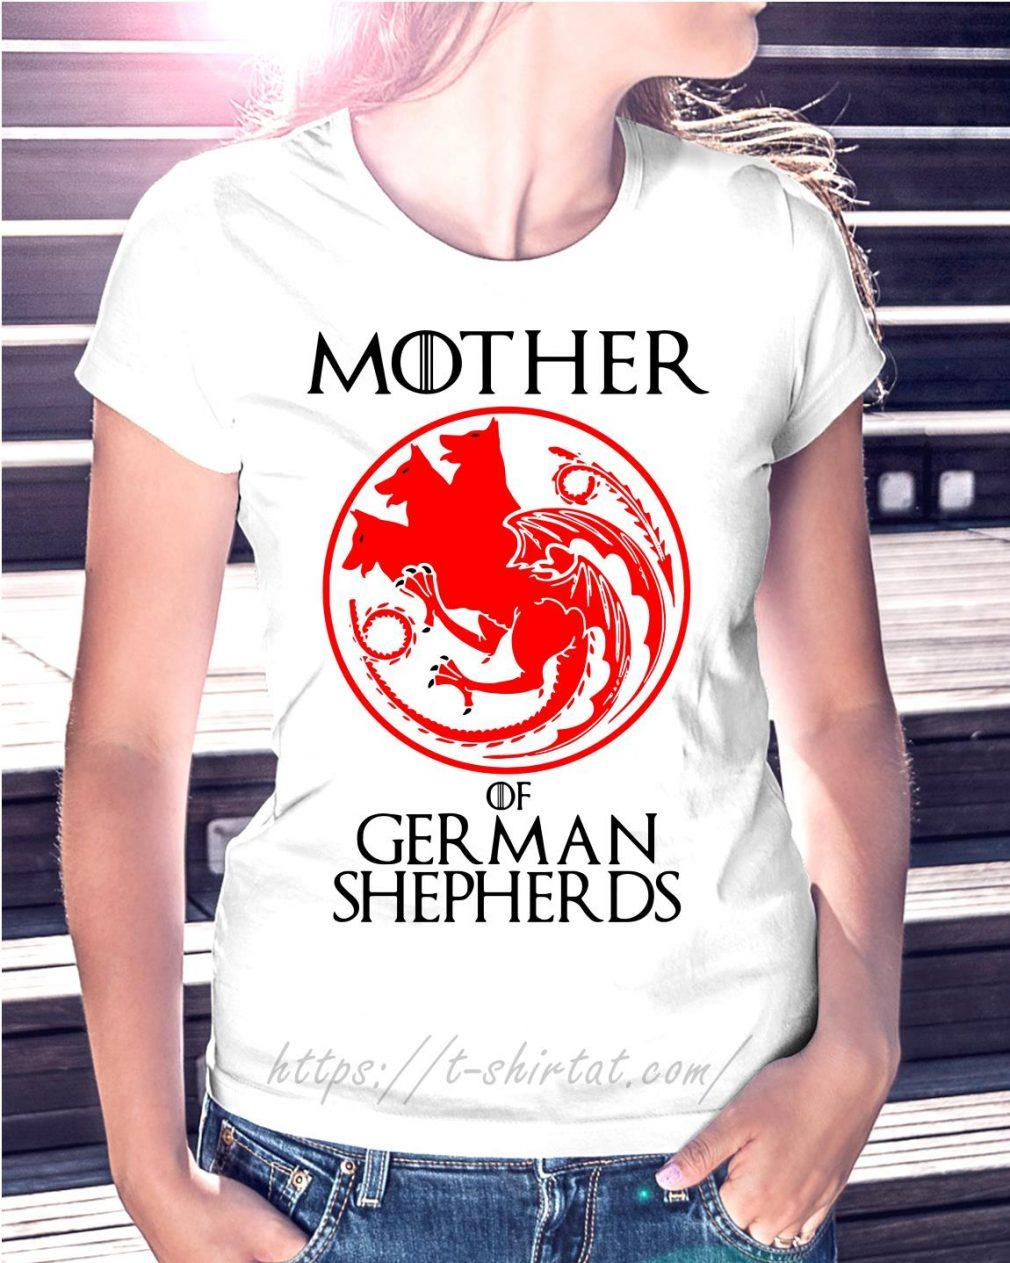 Game of Thrones mother of German shepherds